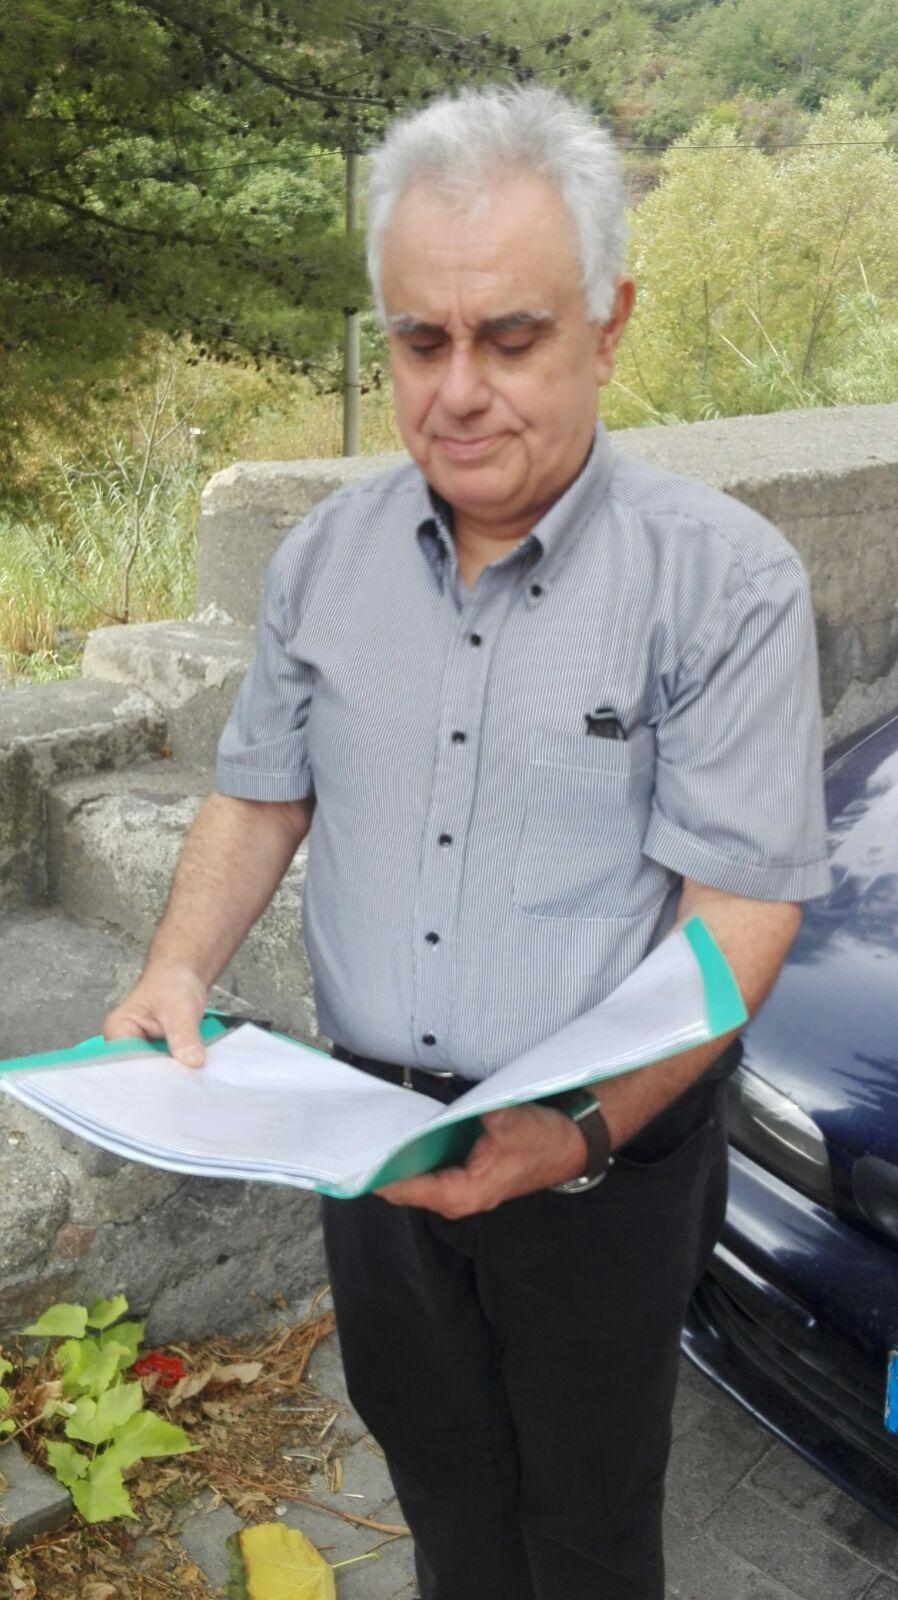 Pasquale Costa